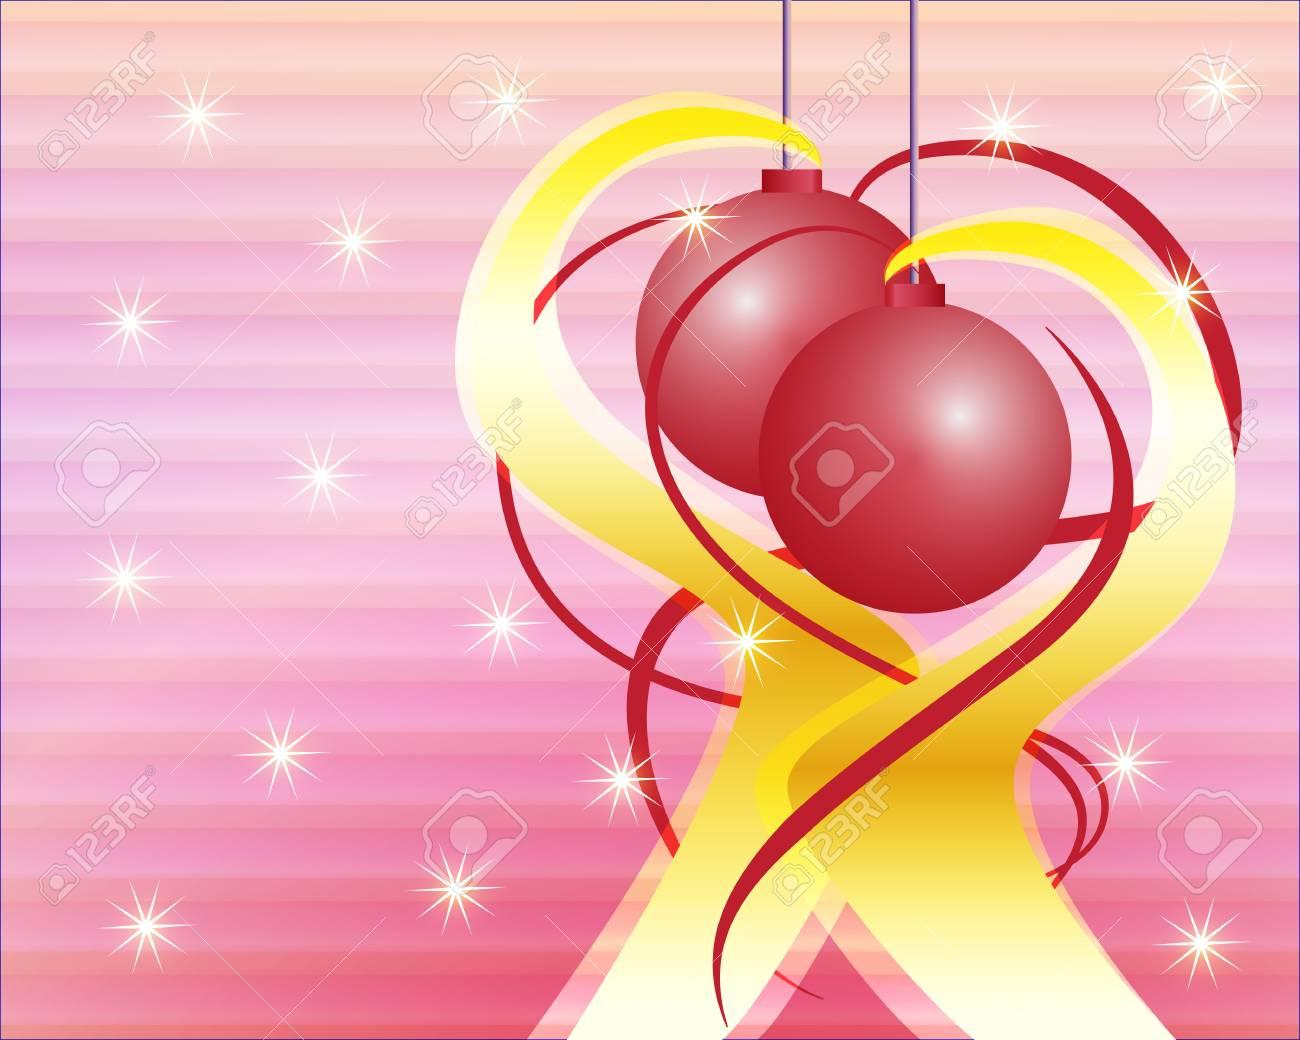 Clip art illustration of decorative Christmas background Stock Illustration - 15616942